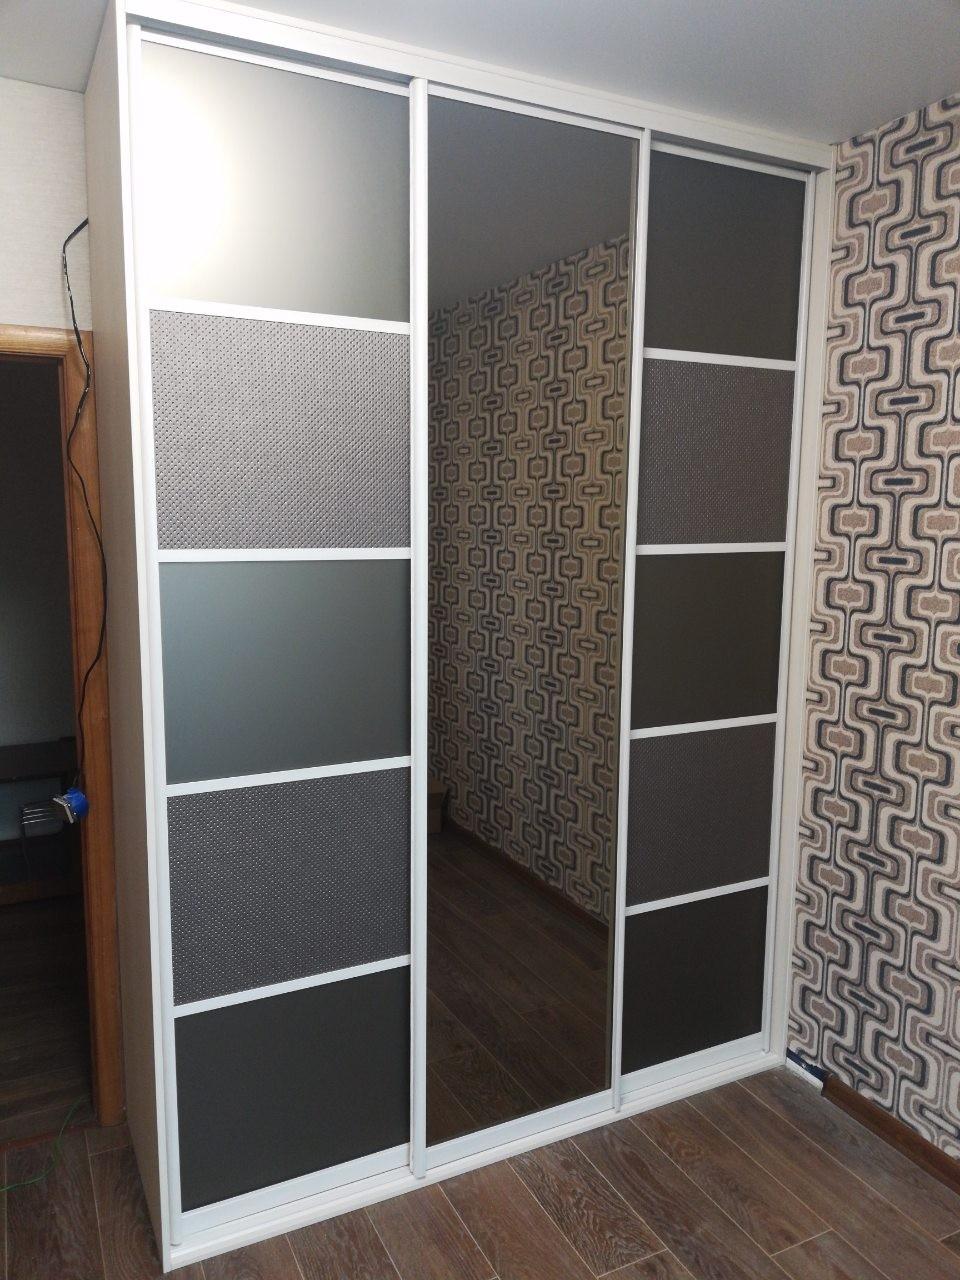 Шкаф-купе со вставками